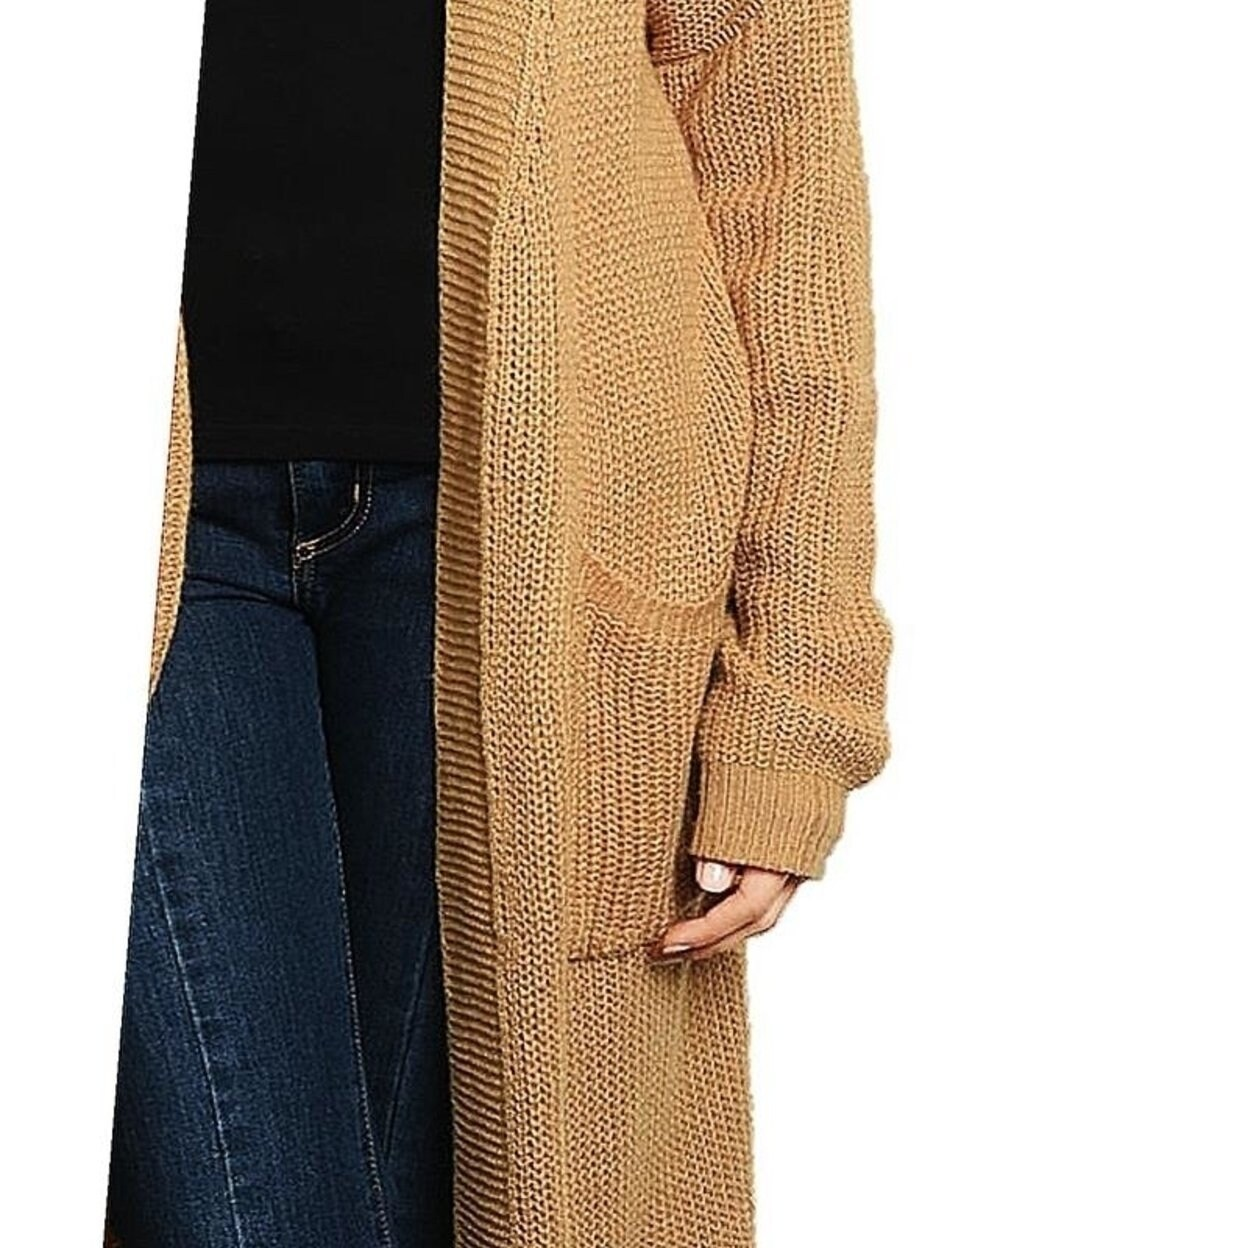 Marled Long Duster Jacket Robe Coat Fall Winter Sweater 208 mv Sweatercoat S M L